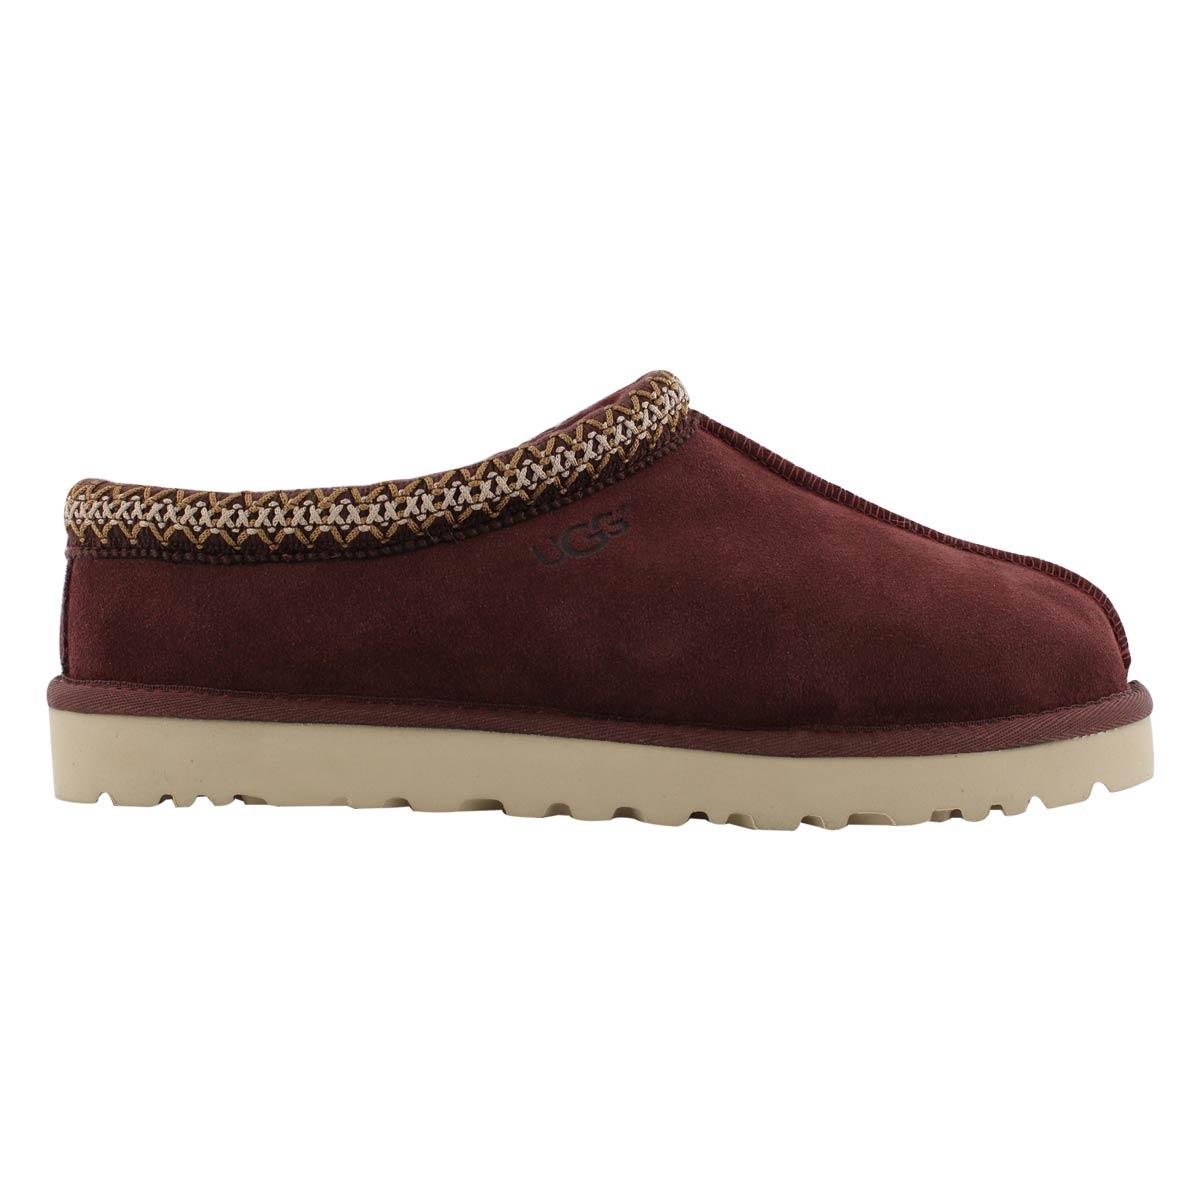 Mns Tasman burgundy sheepskin slipper